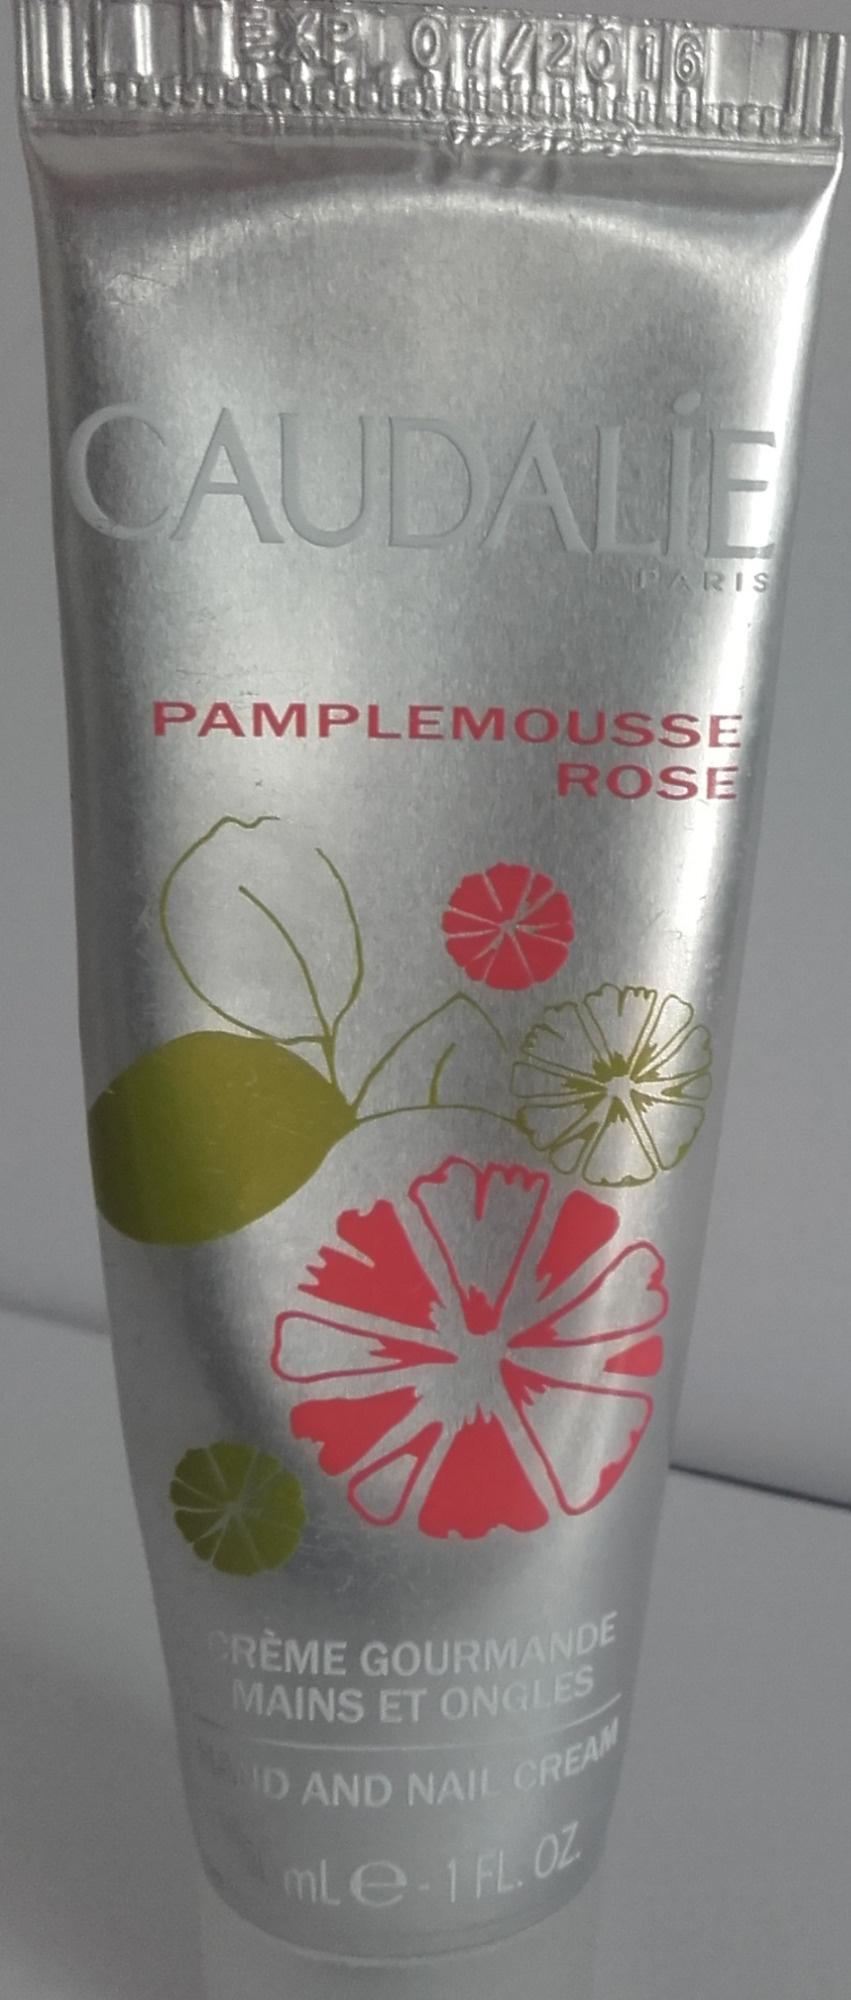 Crème gourmande mains et ongles Pamplemousse rose - Product - fr